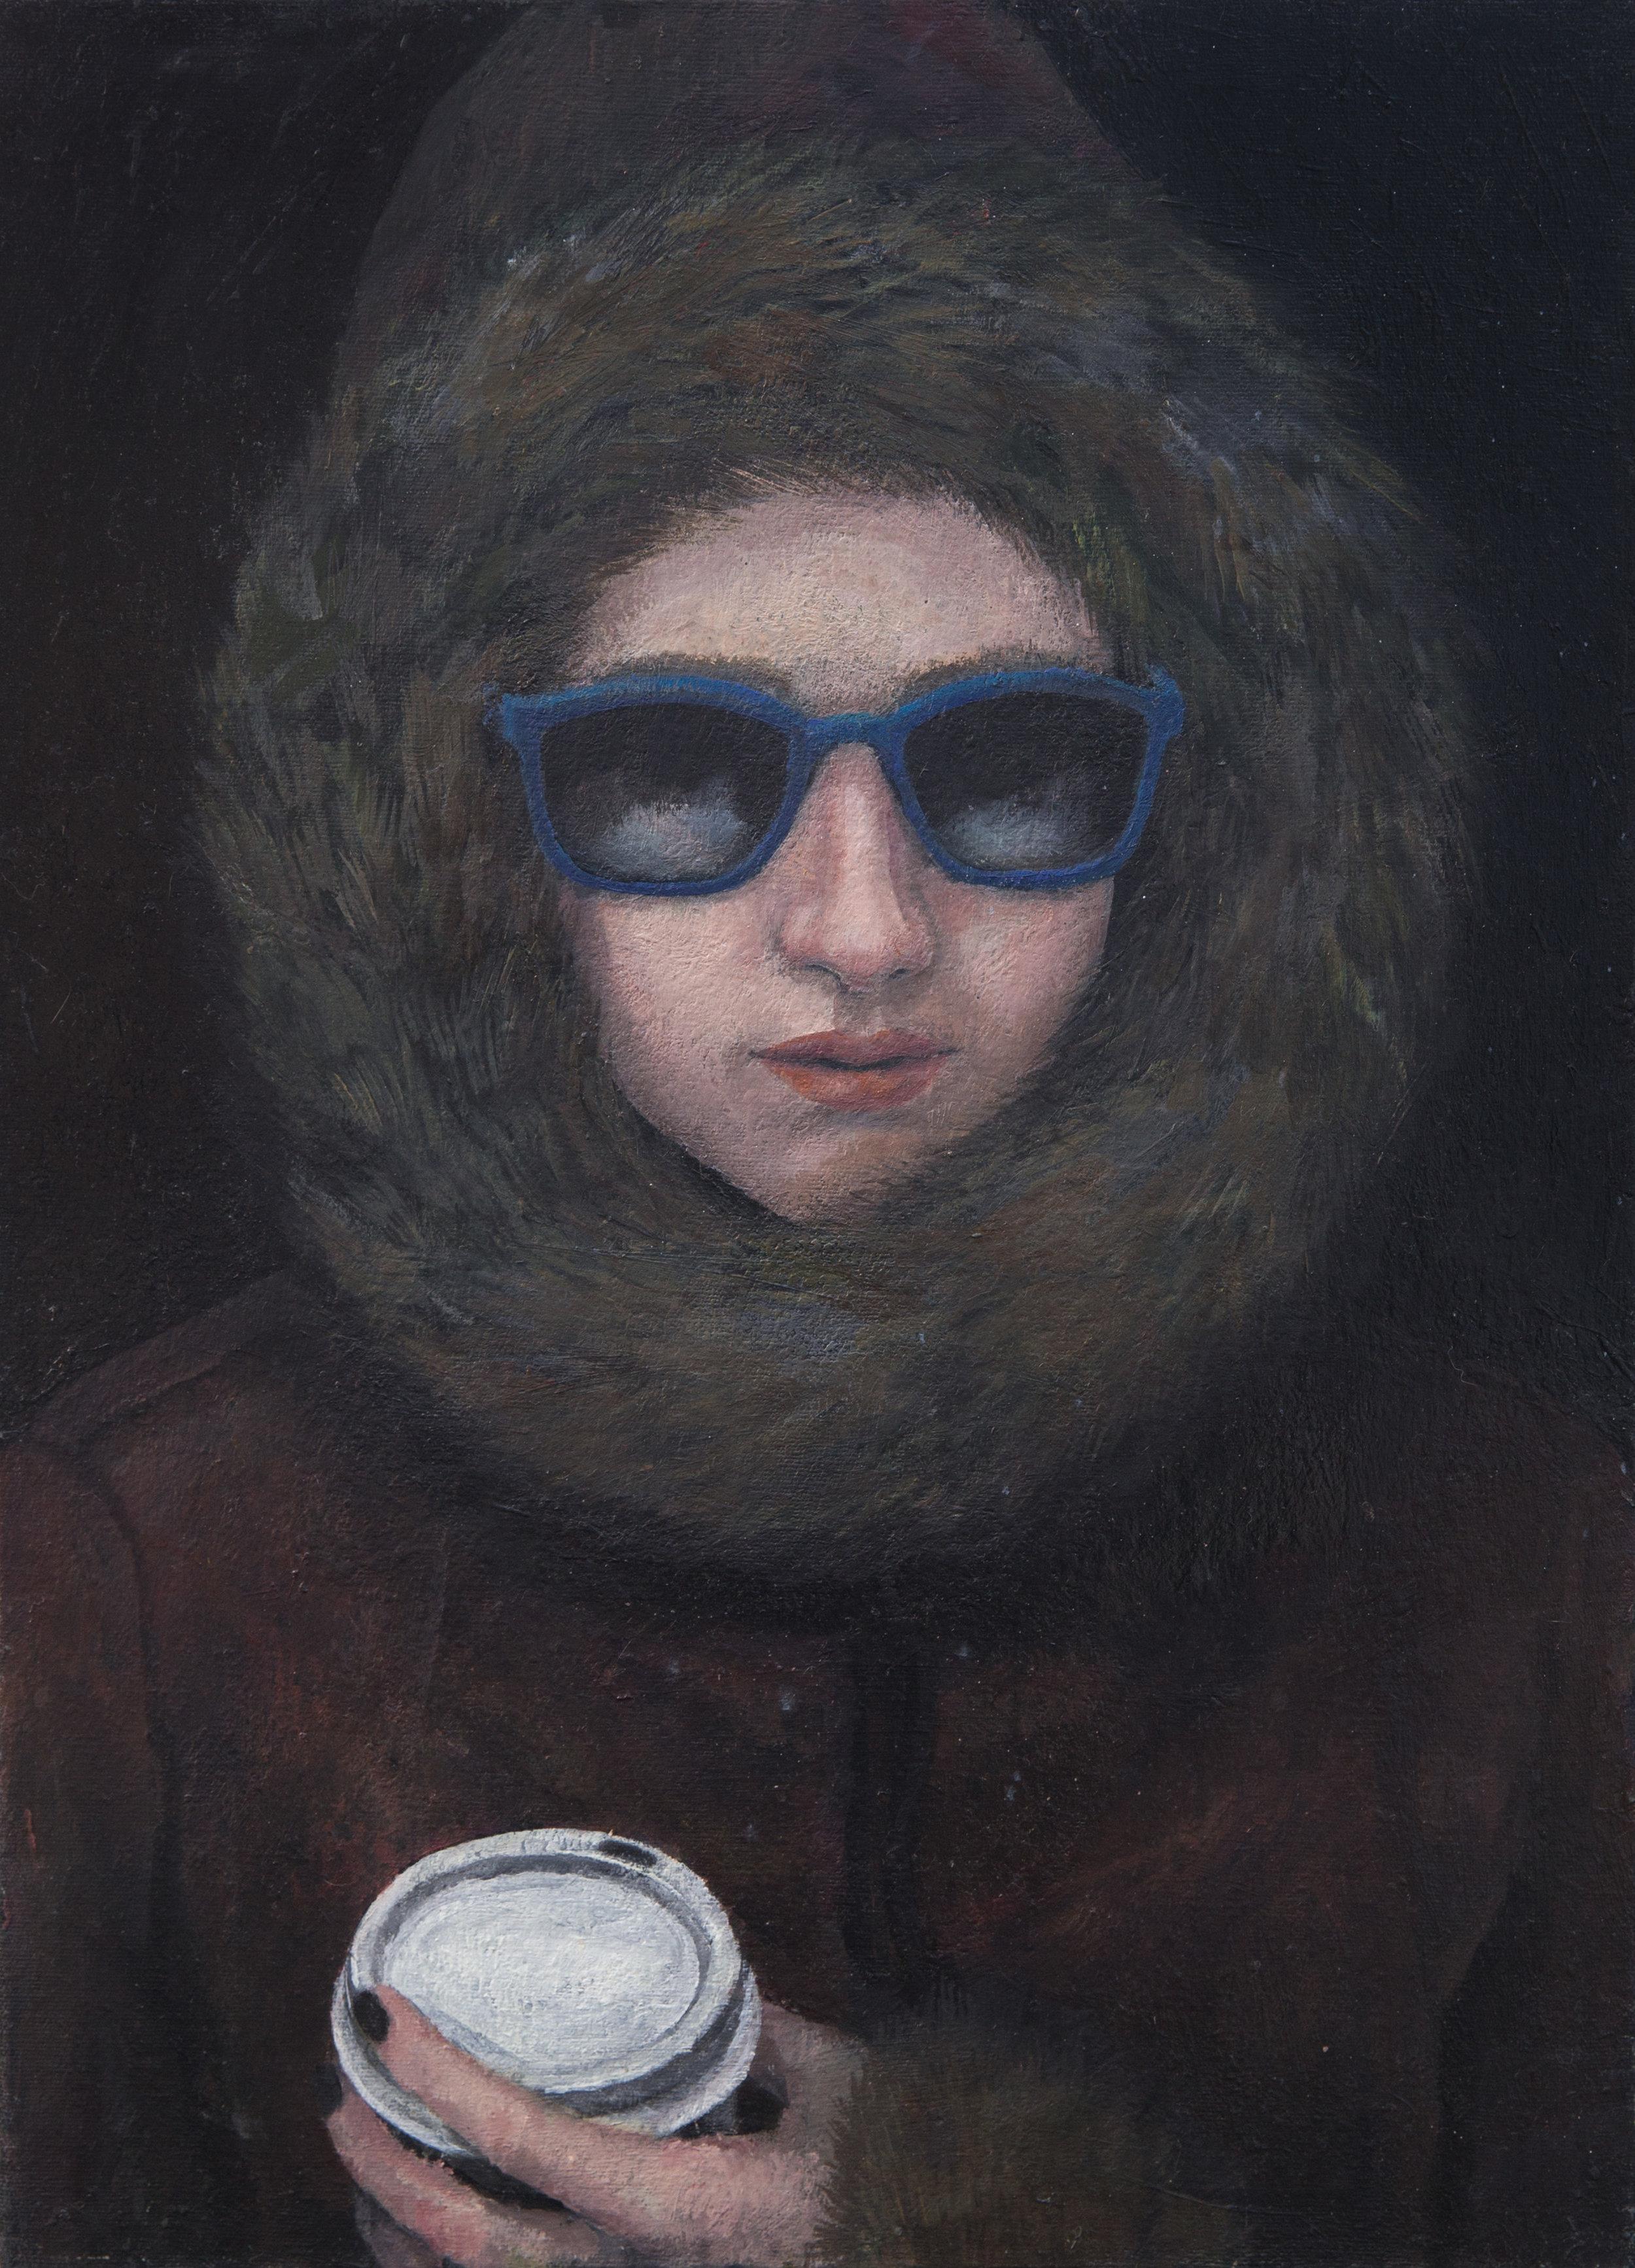 50x35cm, Oil on Canvas